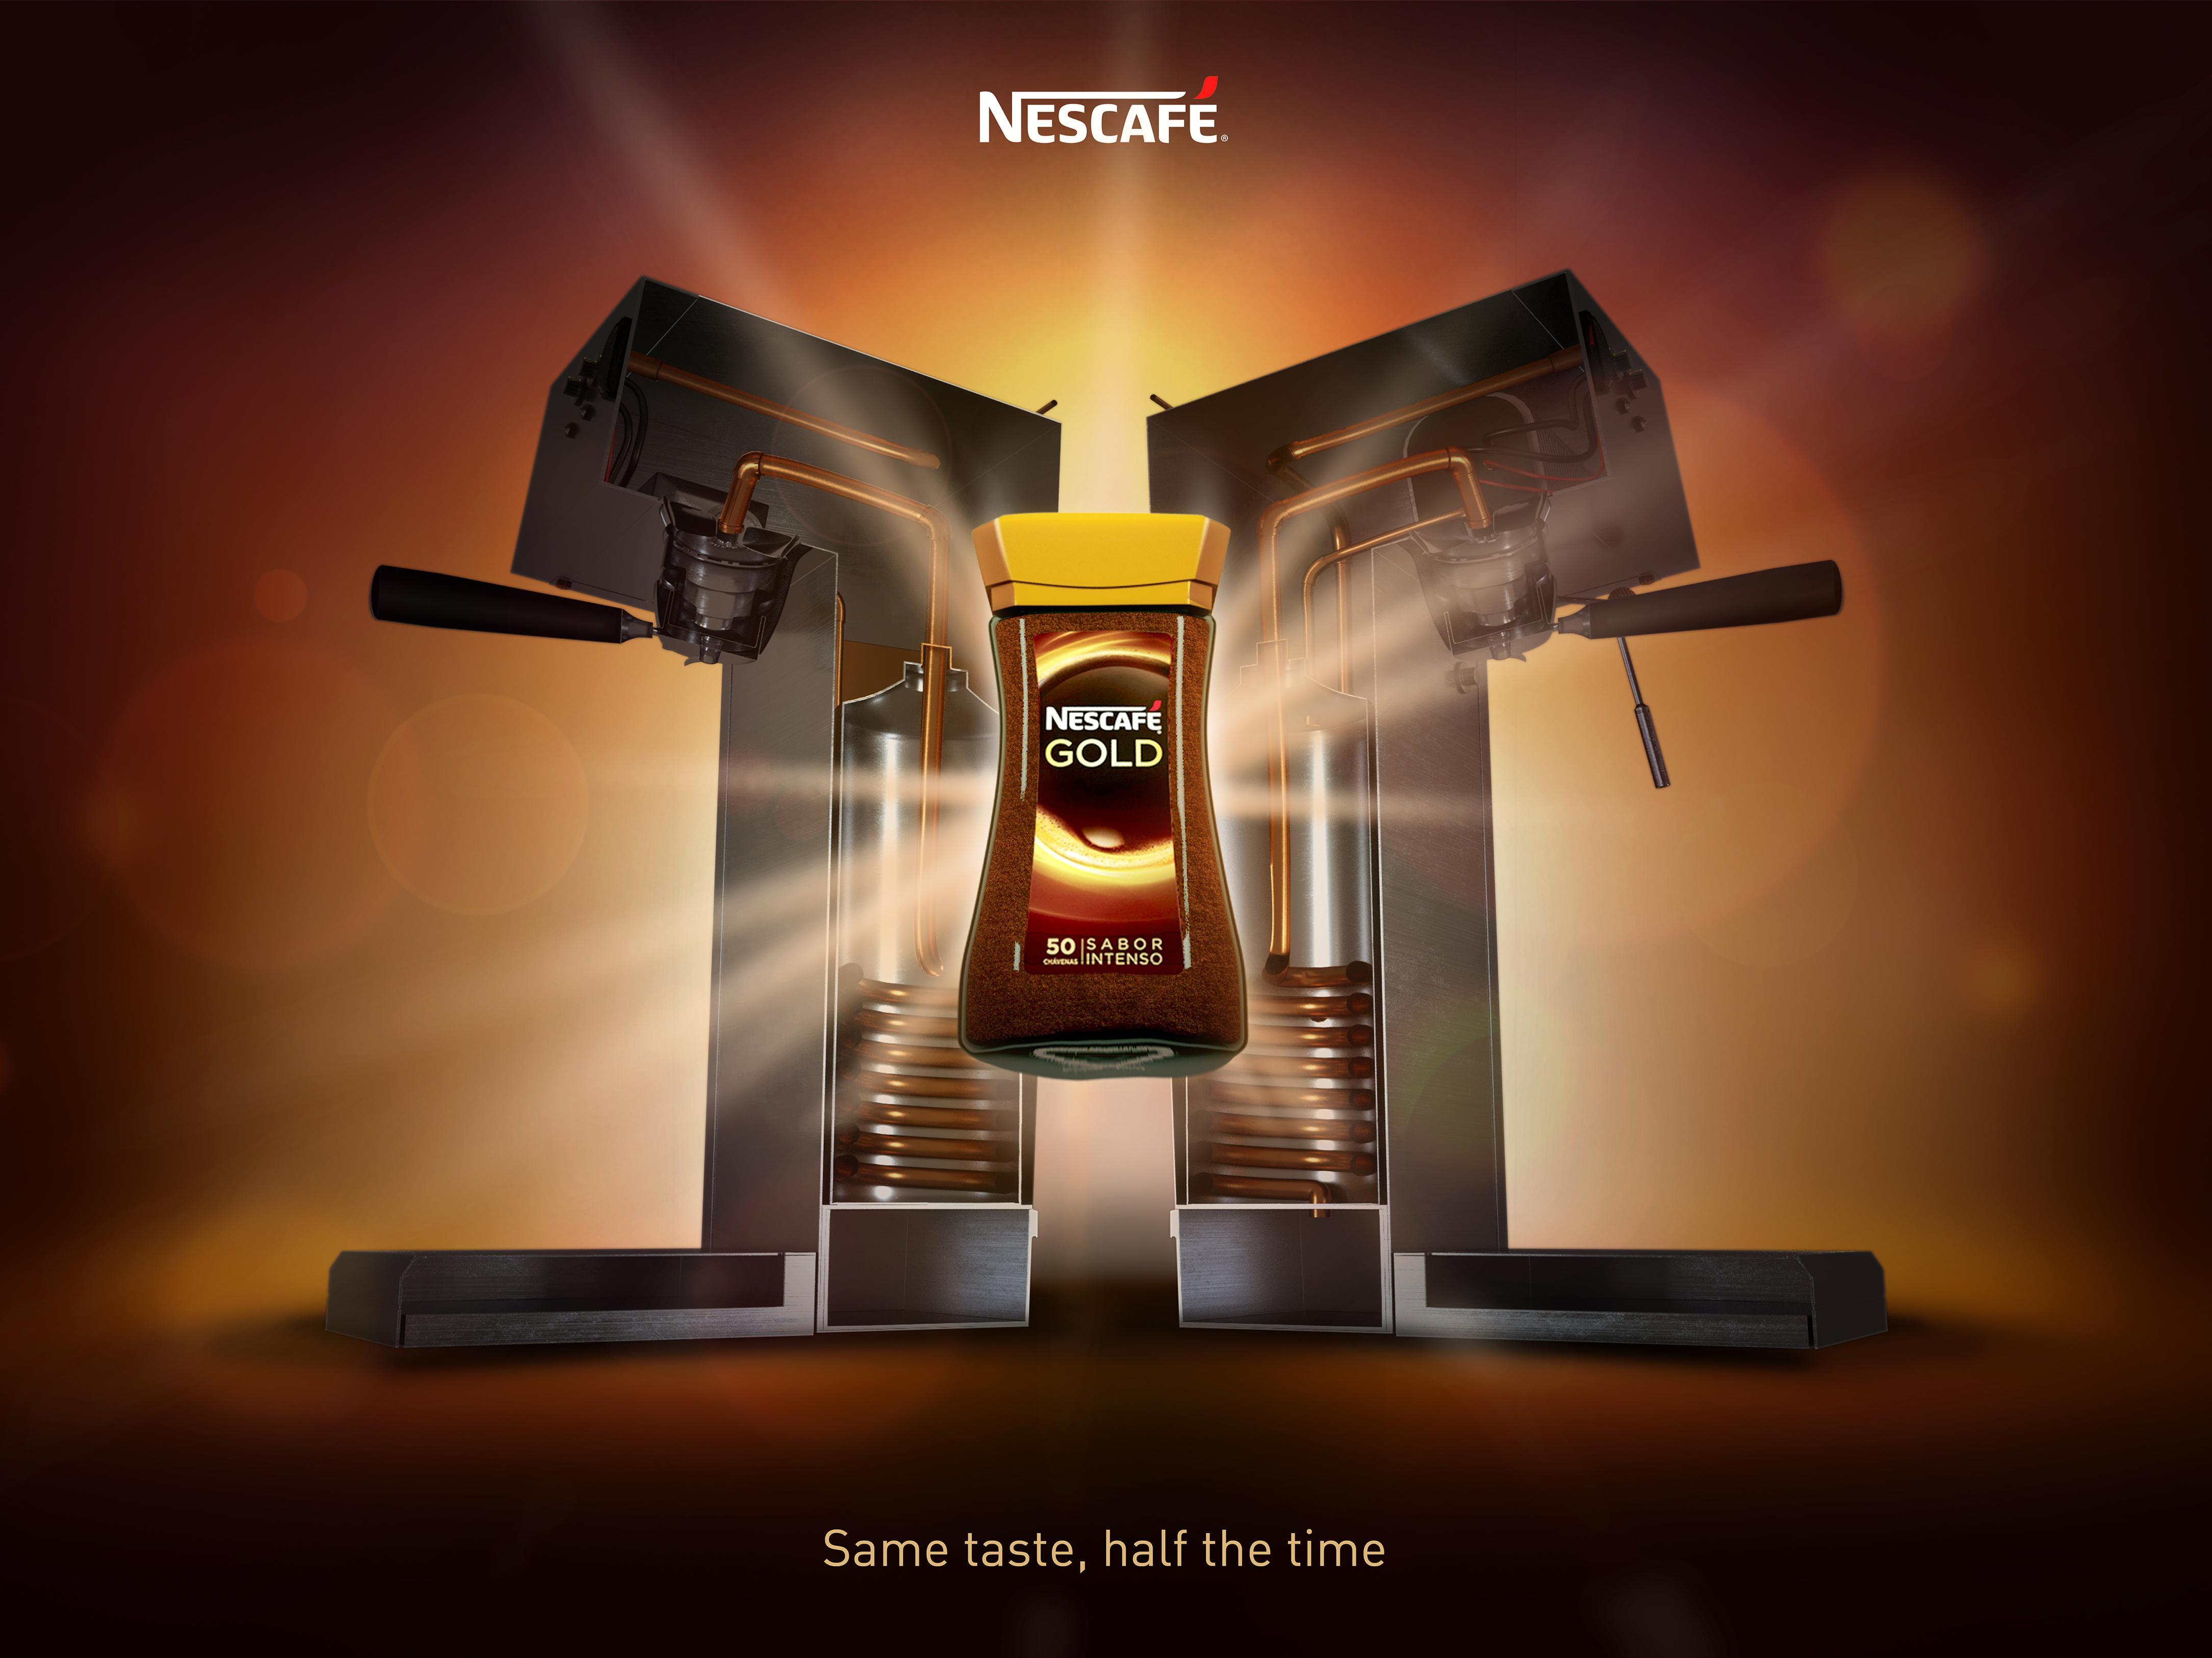 Nescafe Print Ad - Same Taste, 1